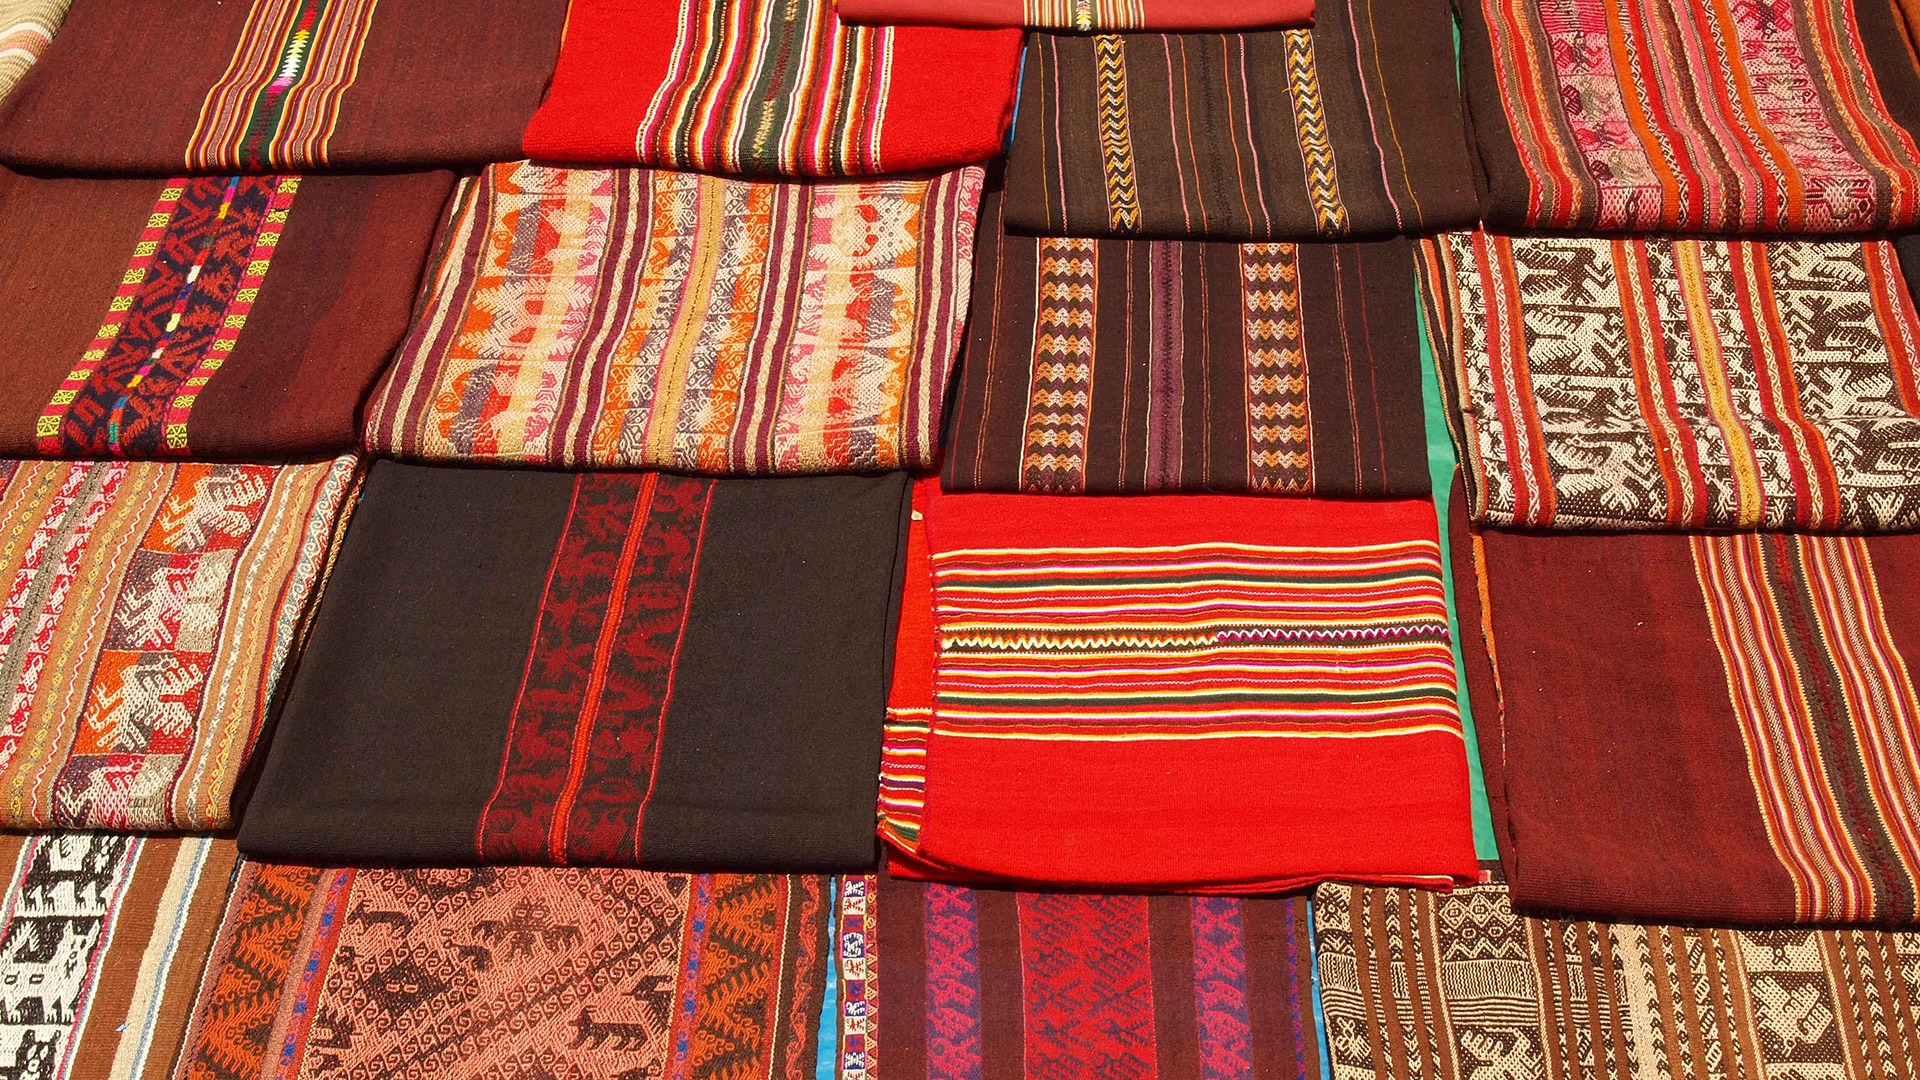 Textiles at the Tarabuco Fair near Sucre, Bolivia